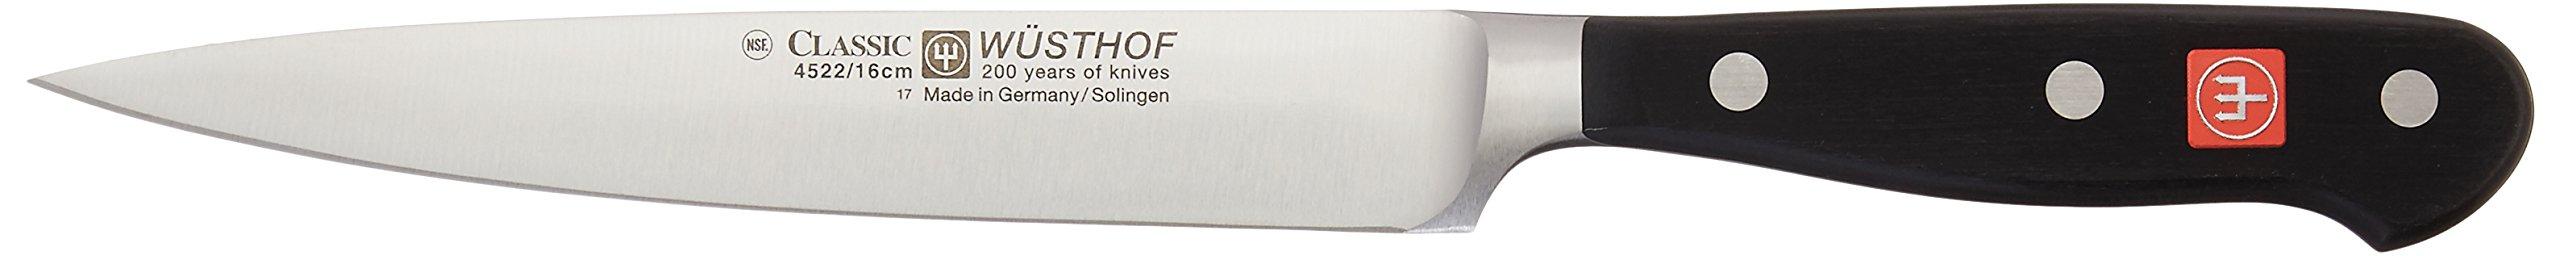 Wusthof Classic Sandwich Knife